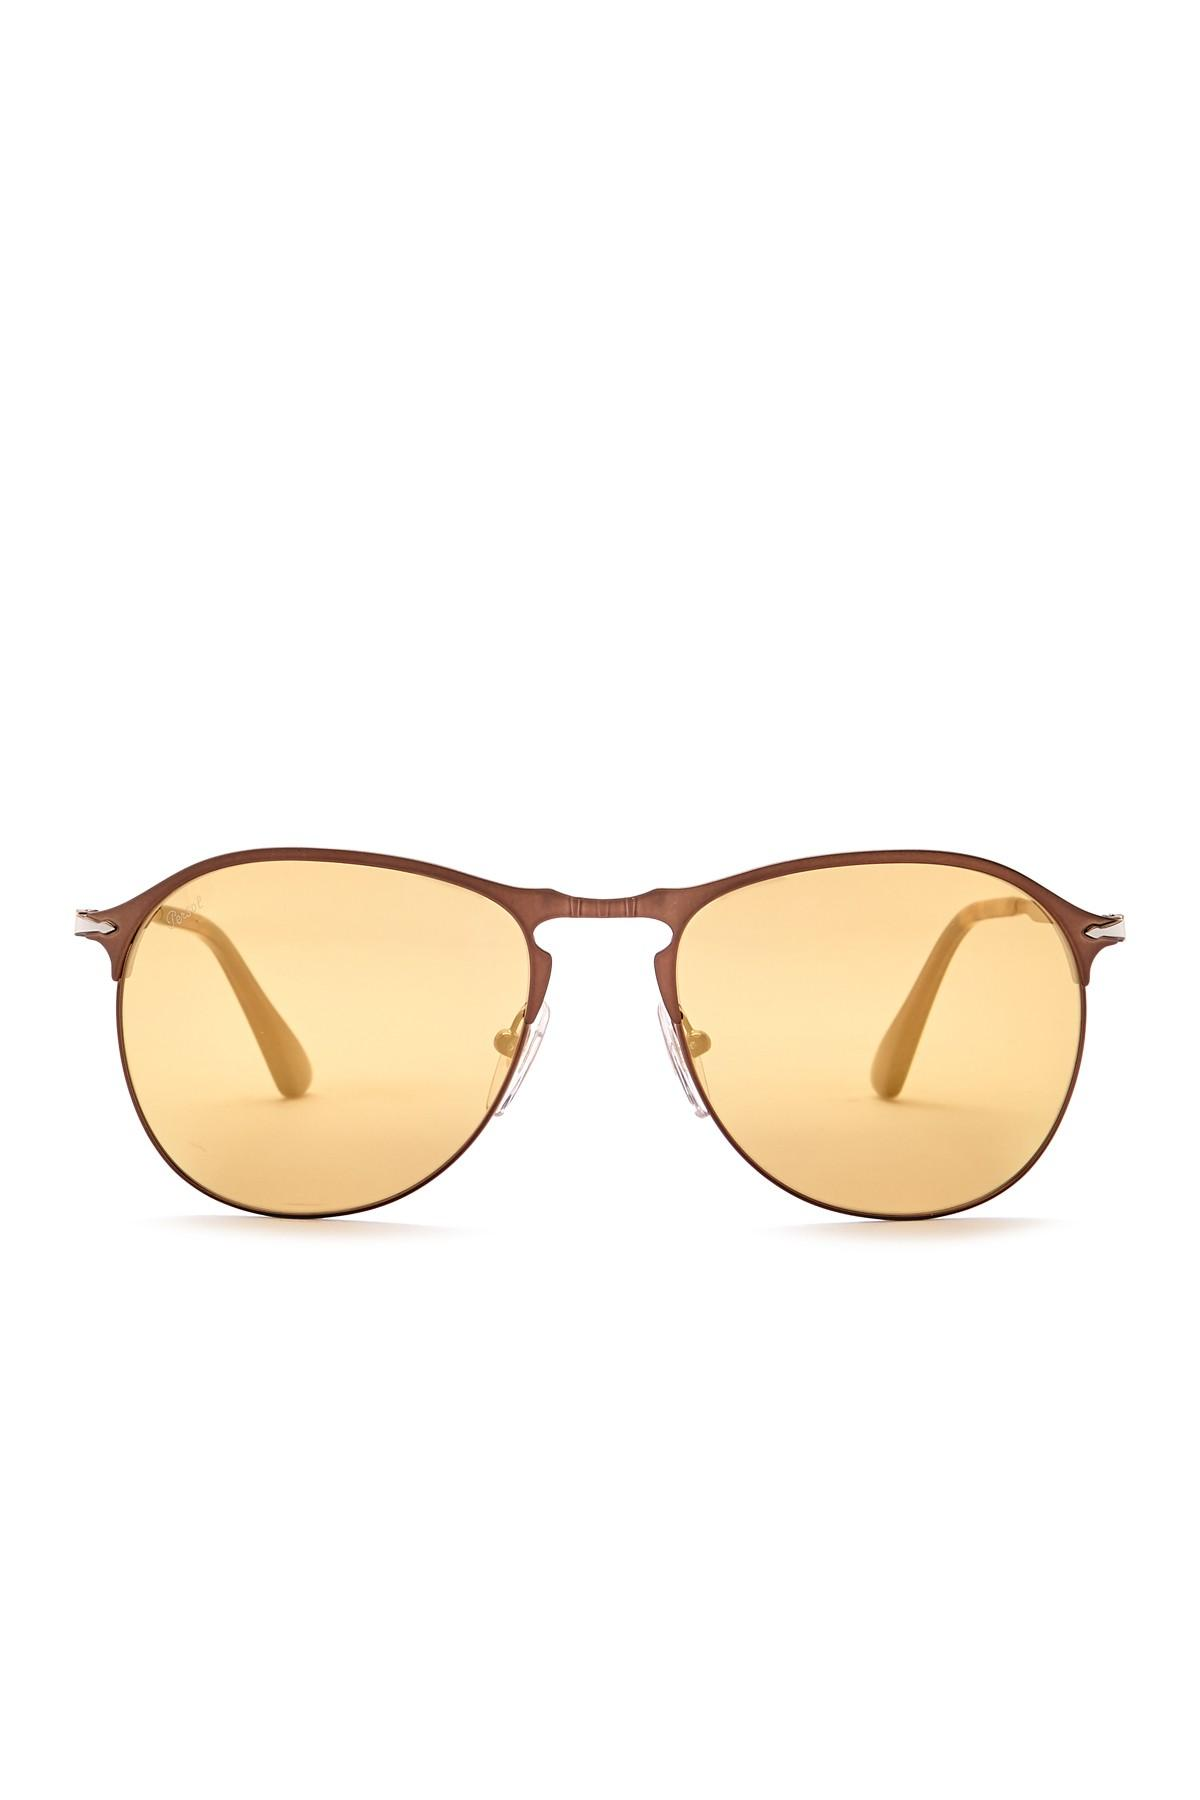 72c27c9abf Persol - Multicolor 56mm Sartoria Sunglasses for Men - Lyst. View fullscreen